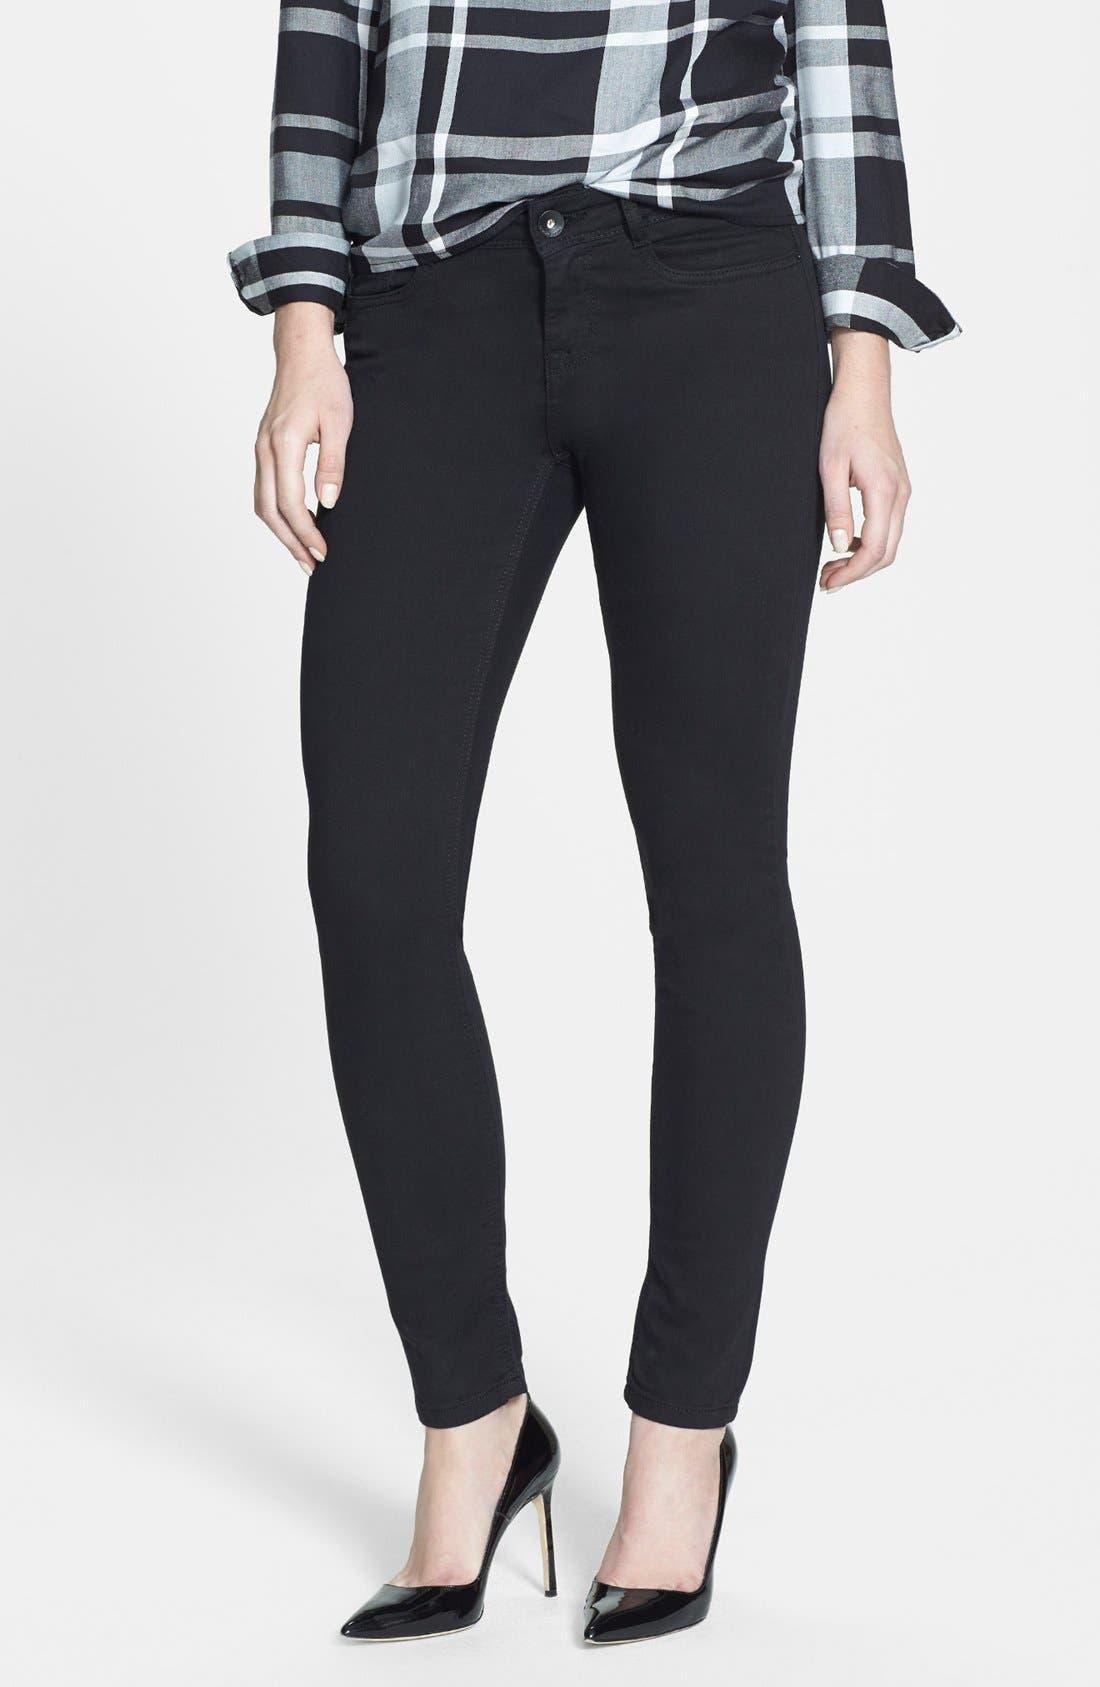 Main Image - kensie 'You Look Pretty' Stretch Denim Skinny Jeans (Black)